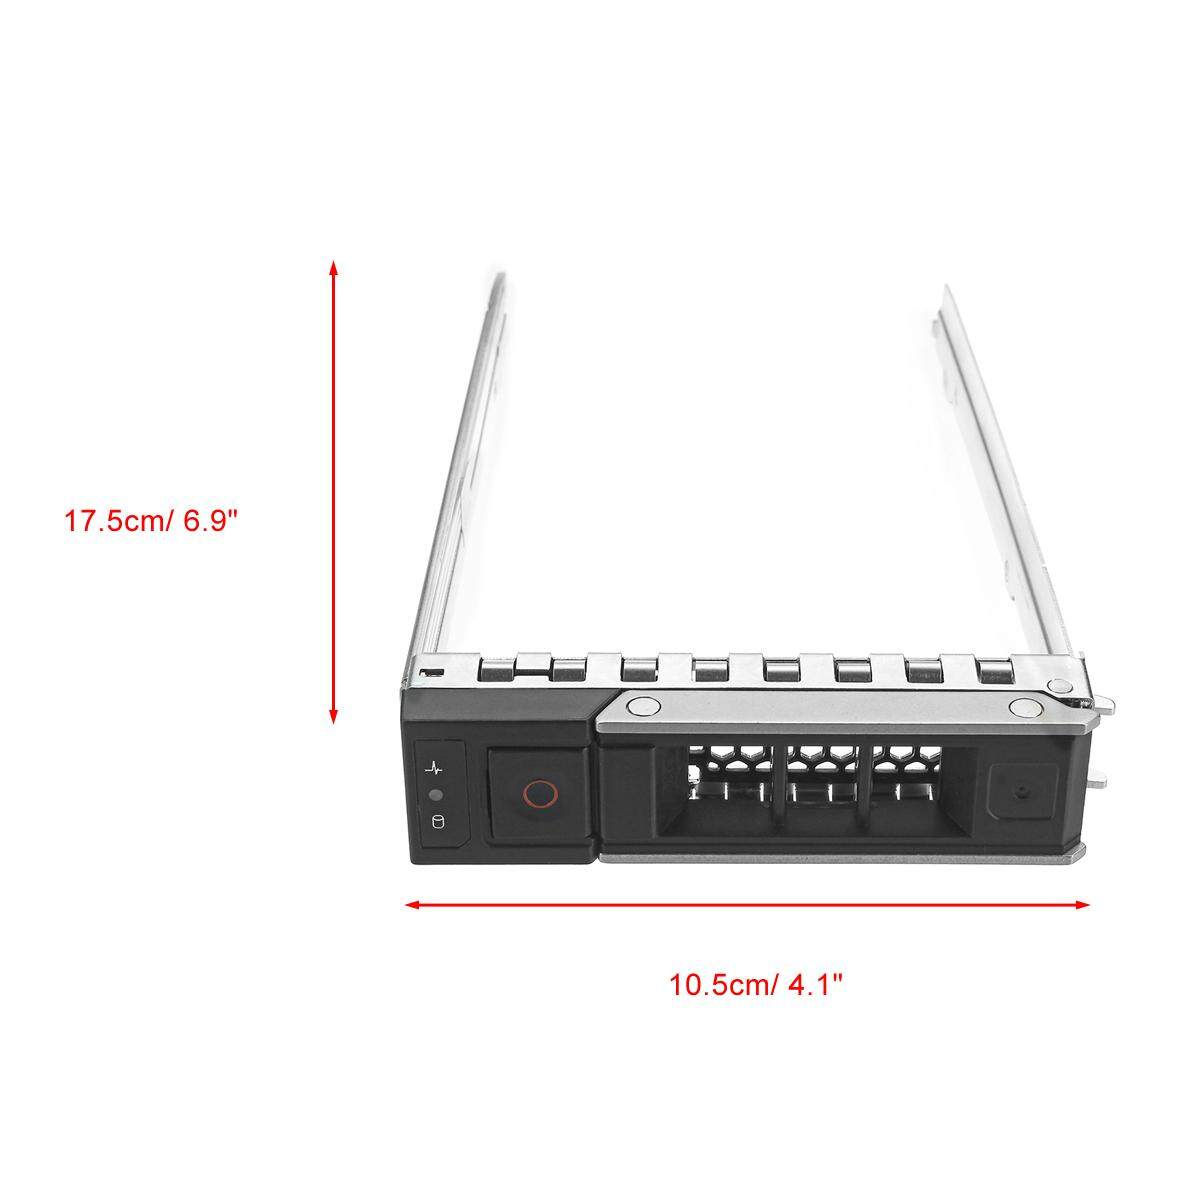 3.5'' X7K8W HDD Tray Caddy For DELL R440 R640 R740 T640 3.5'' HDD Tray Caddy